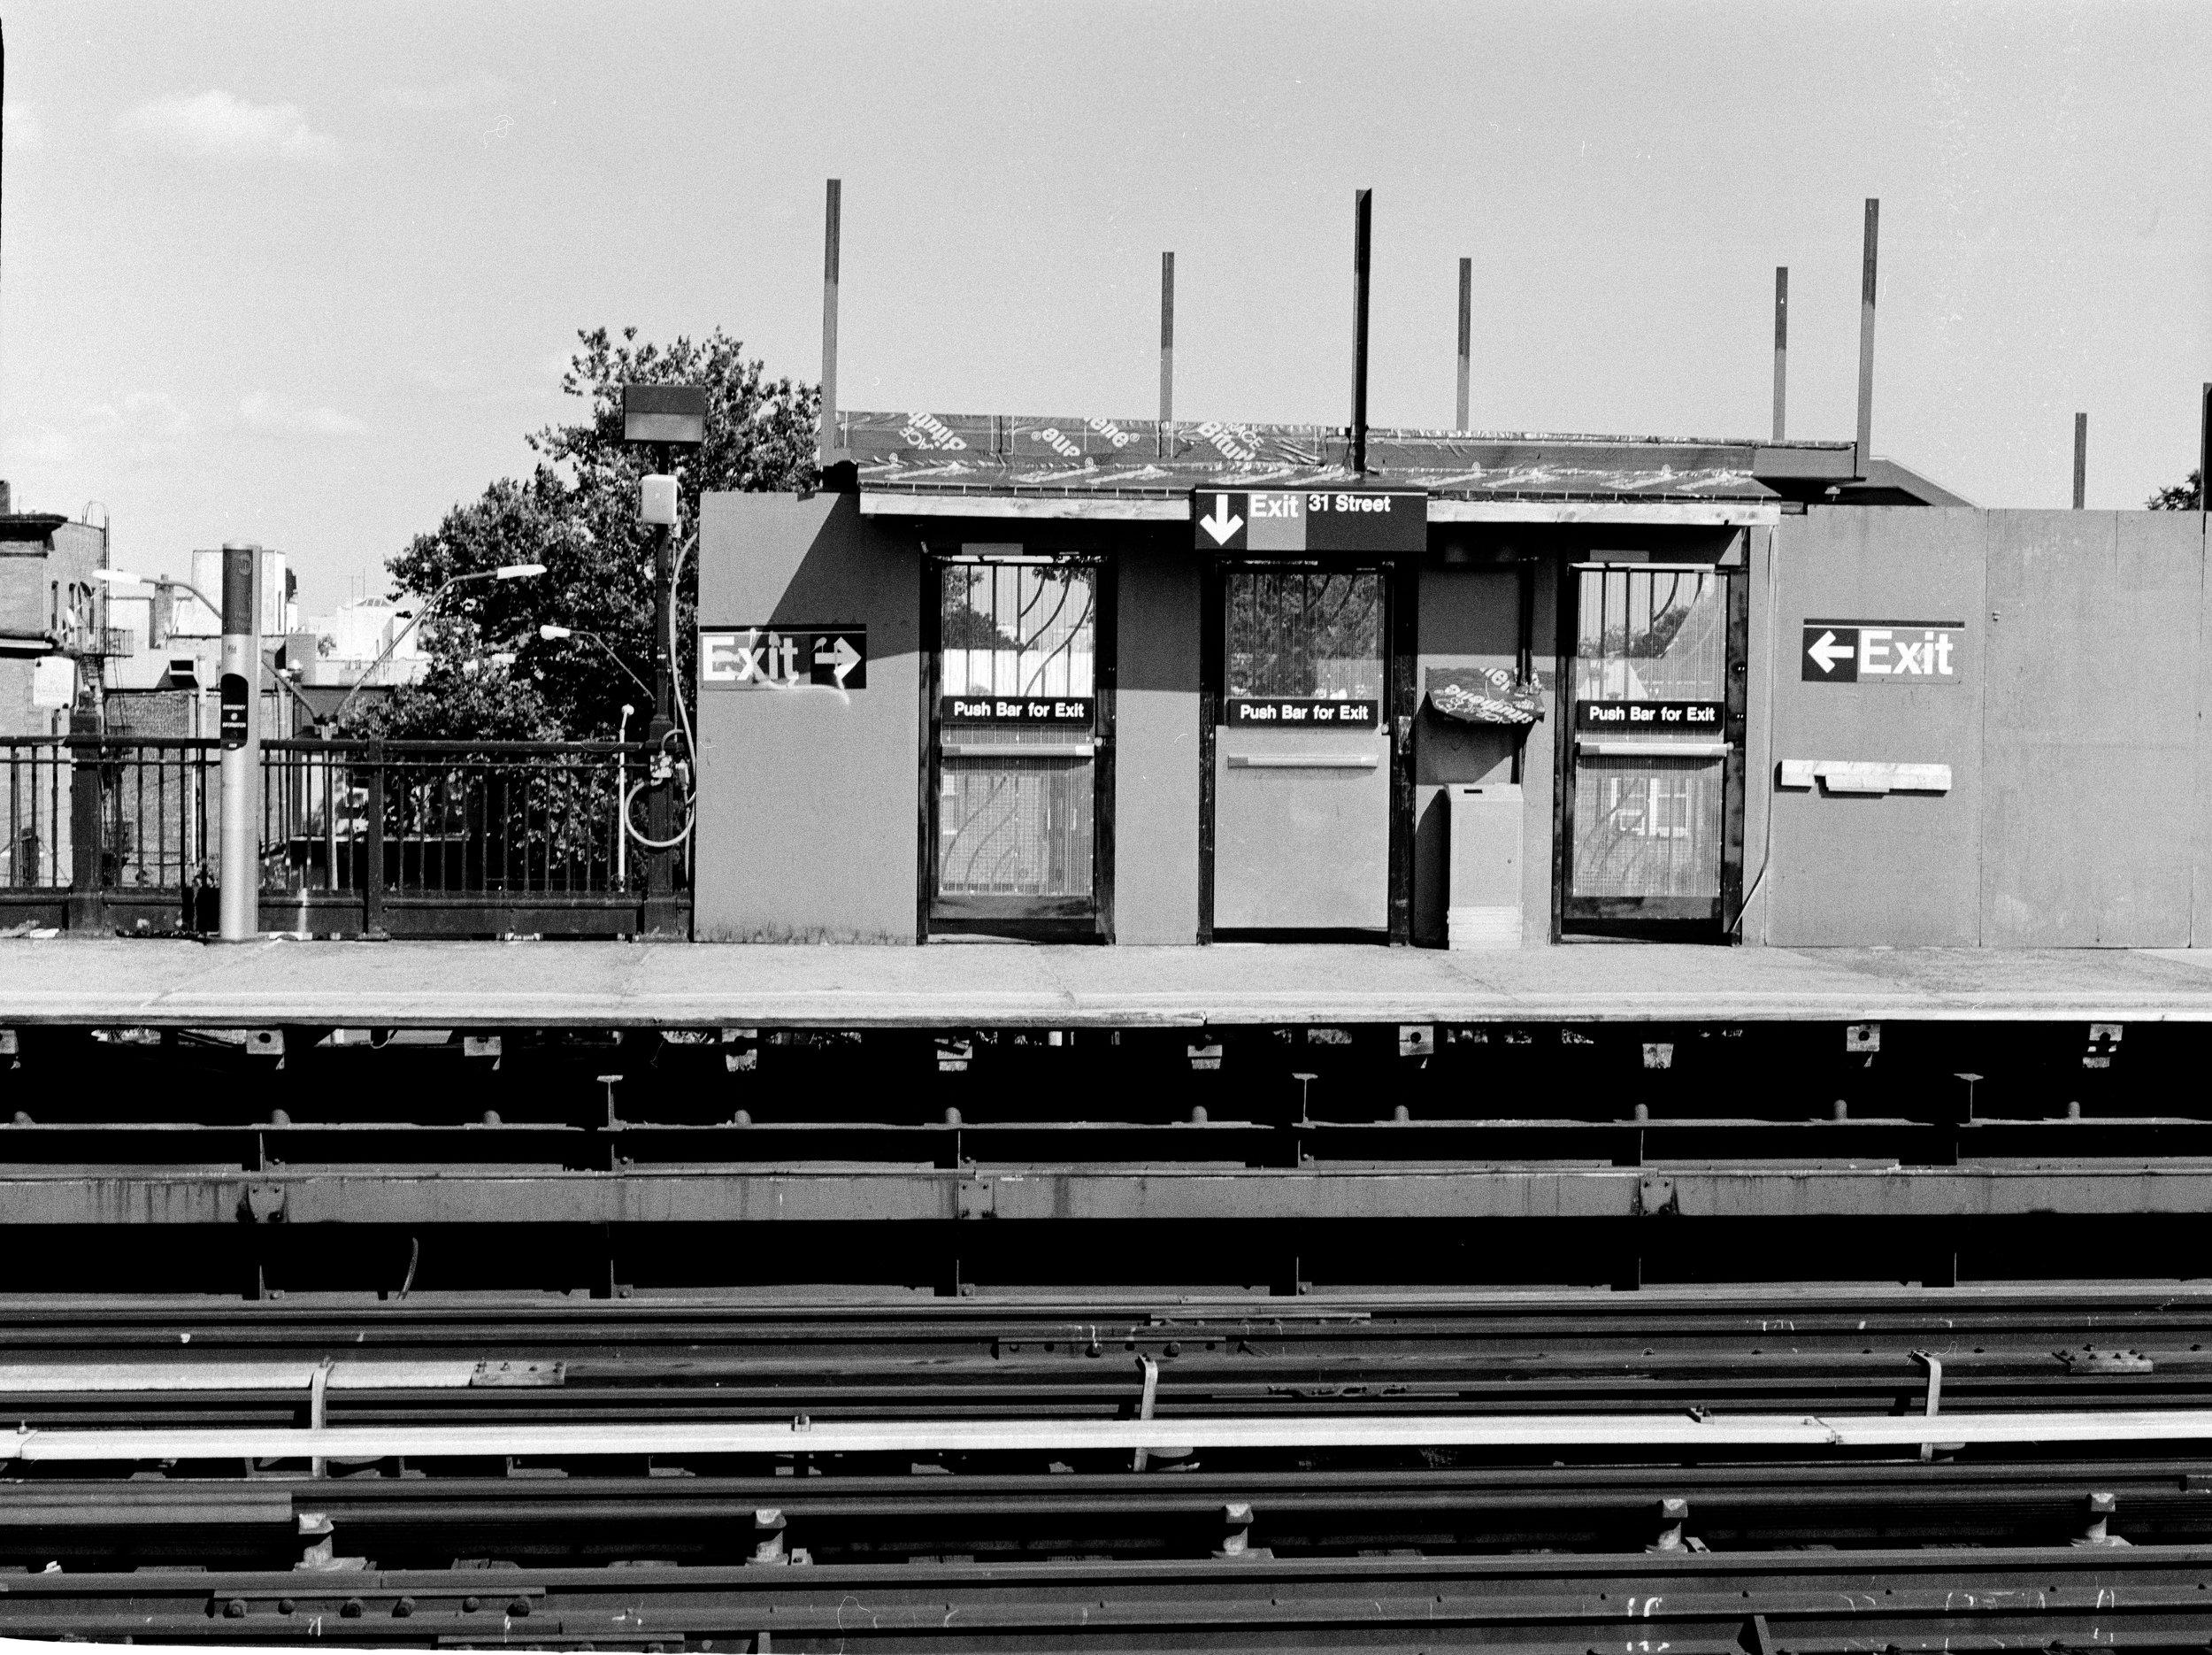 NYC_summer2018_1a.jpg